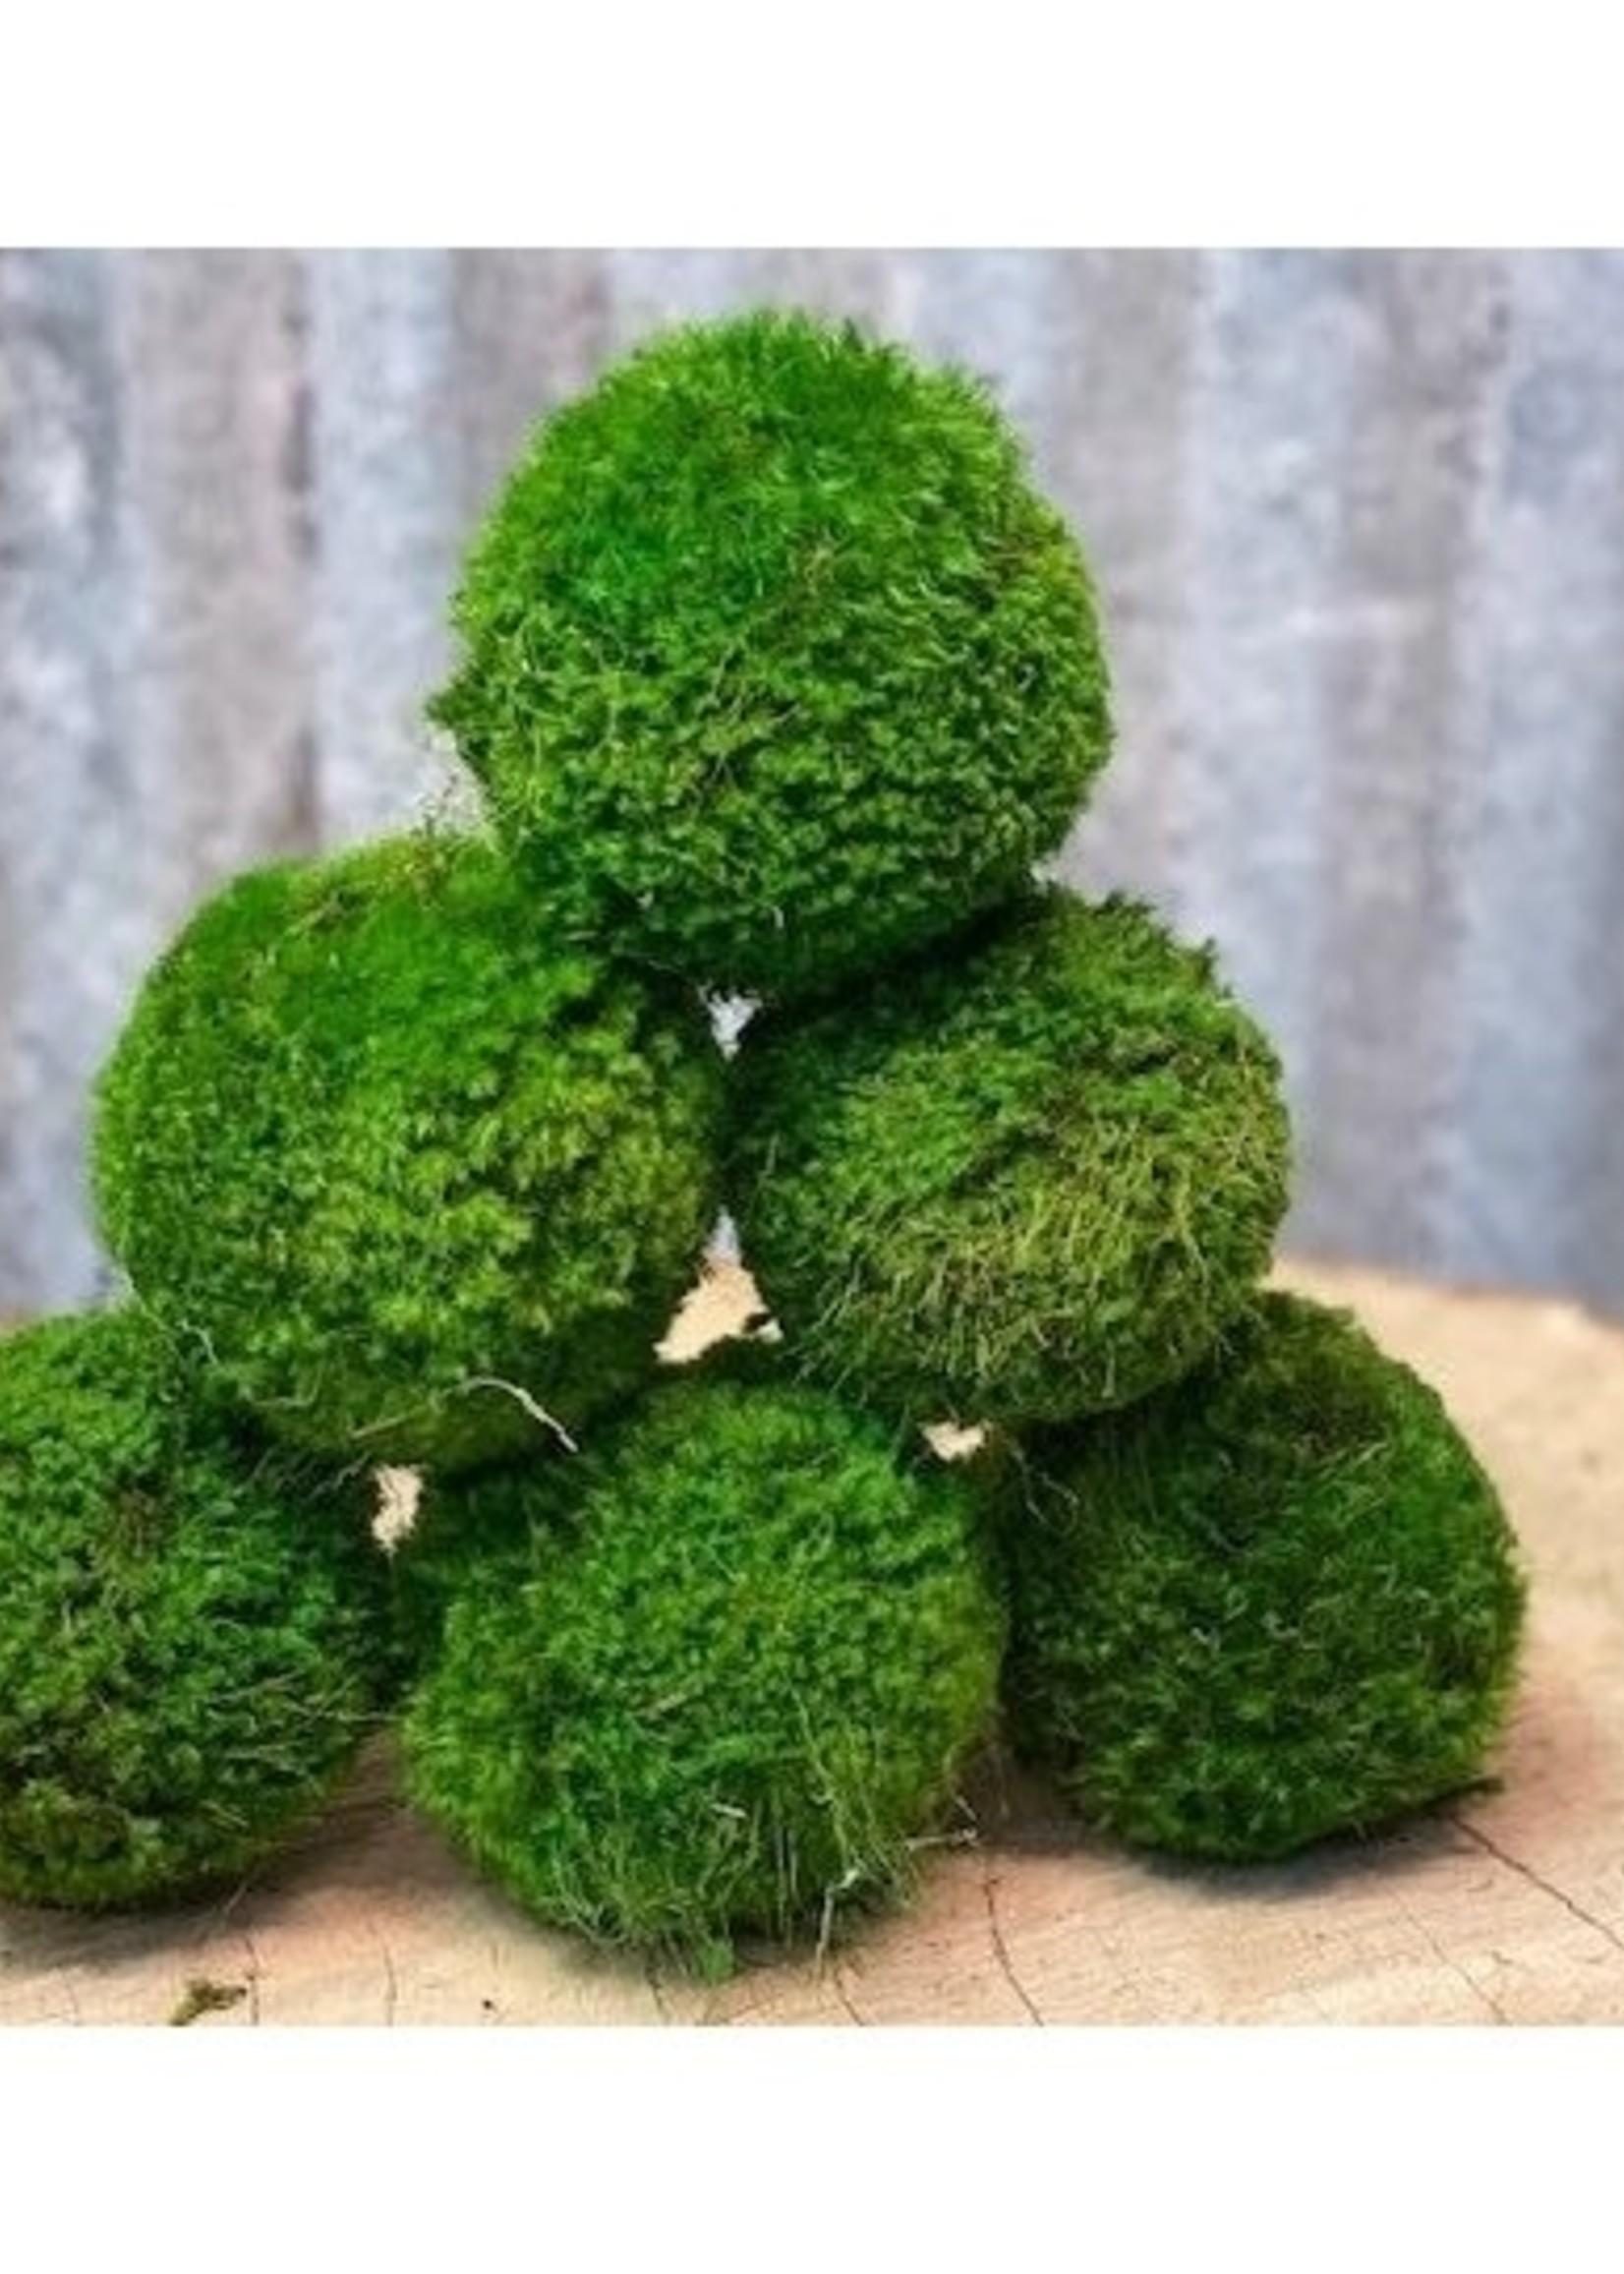 Moss Ball Small